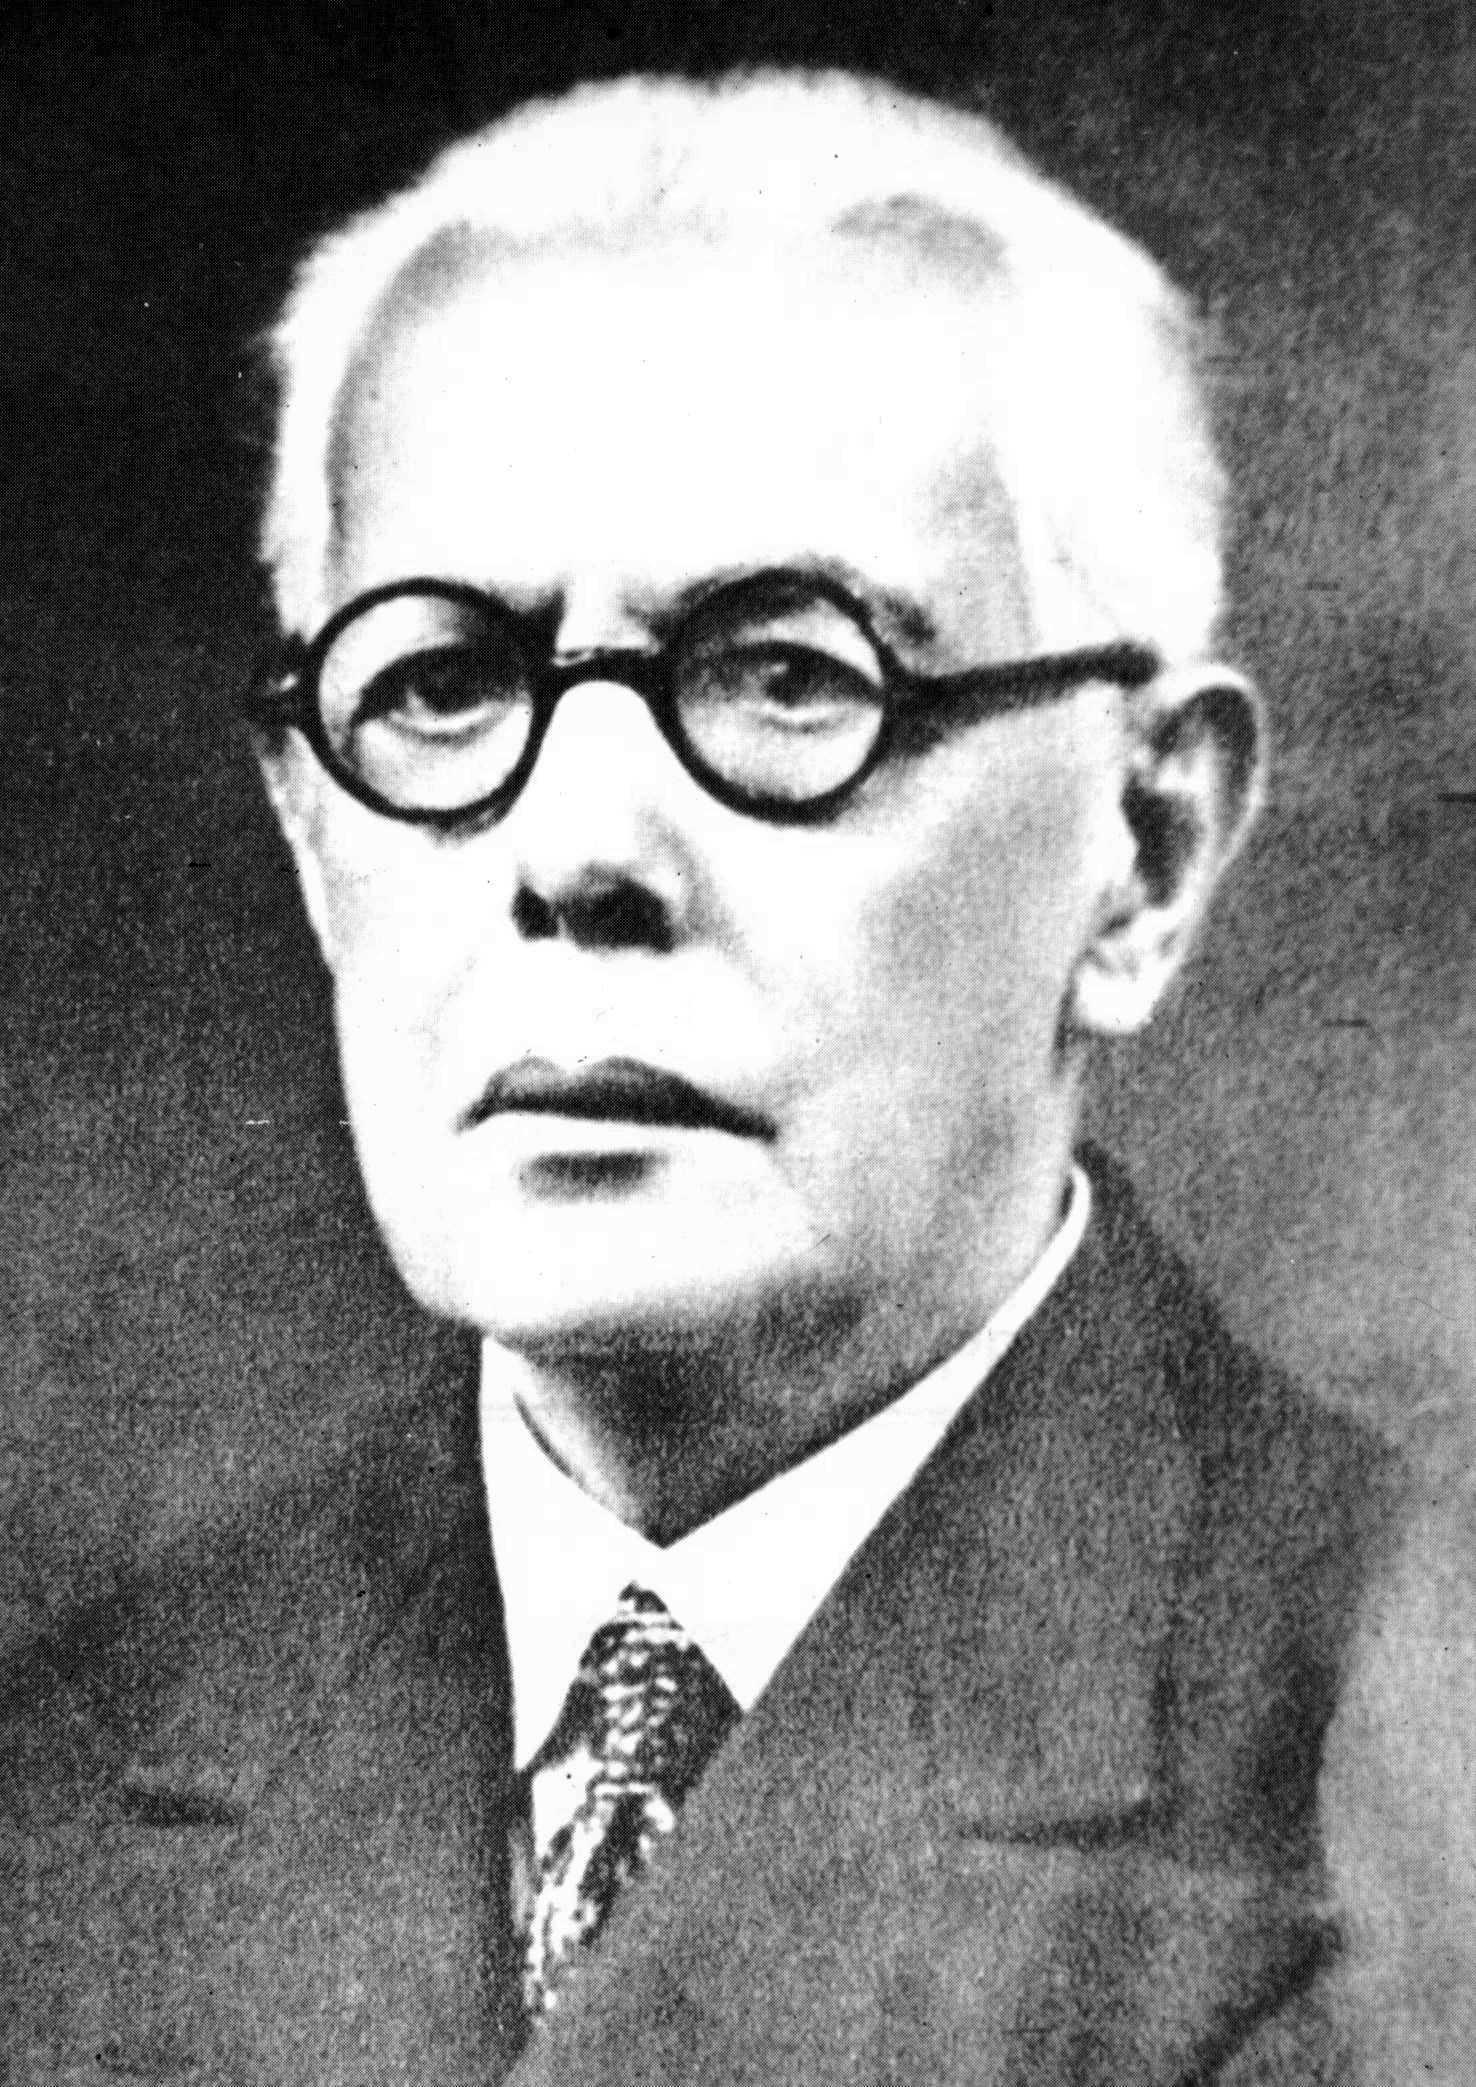 Avelino Fóscolo (1942)